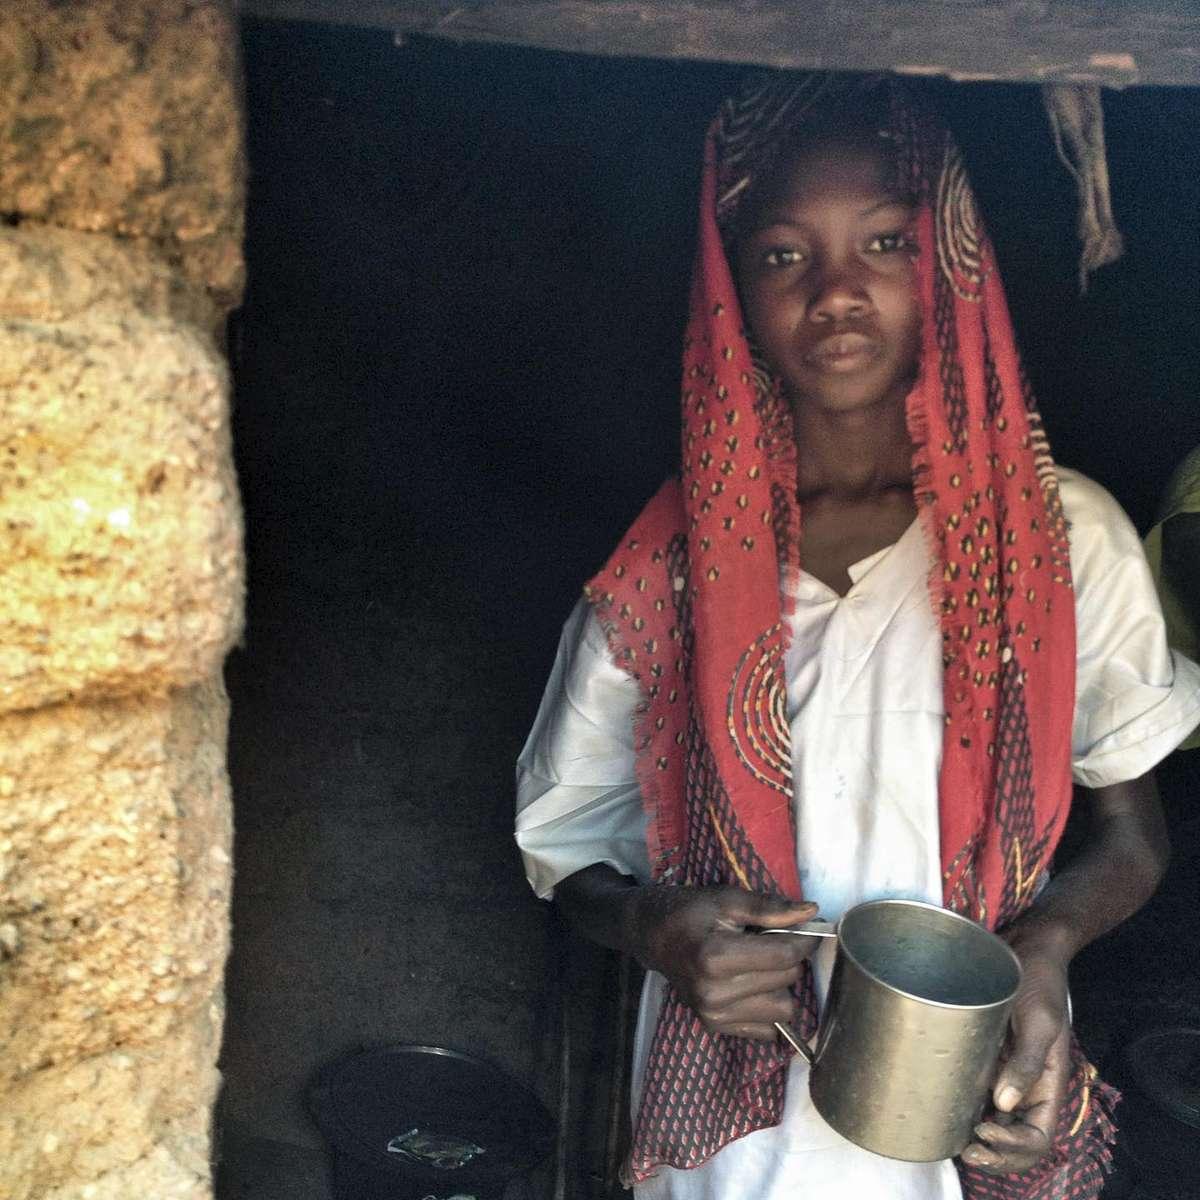 A young girl at a Darfuri refugee camp in Eastern Chad. November 2013.